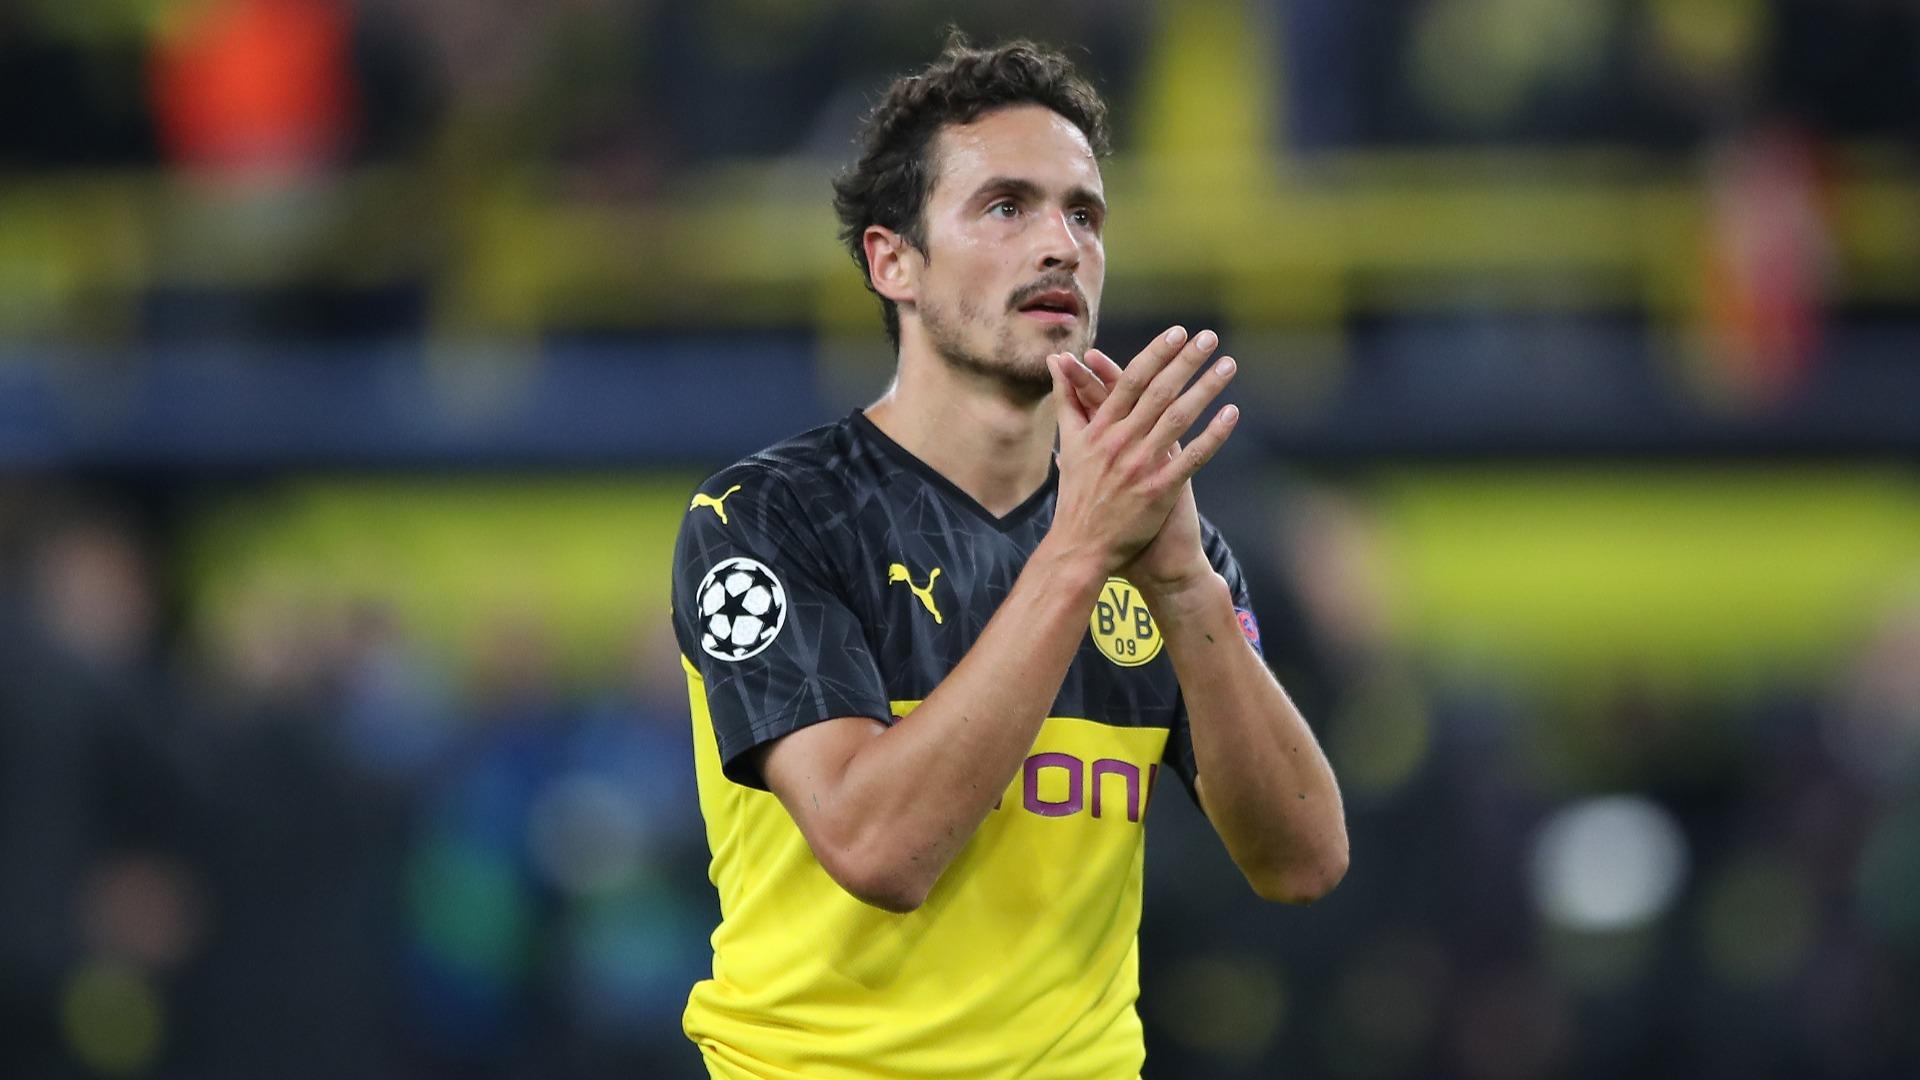 Dortmund's Delaney out until 2020 with torn ankle ligaments